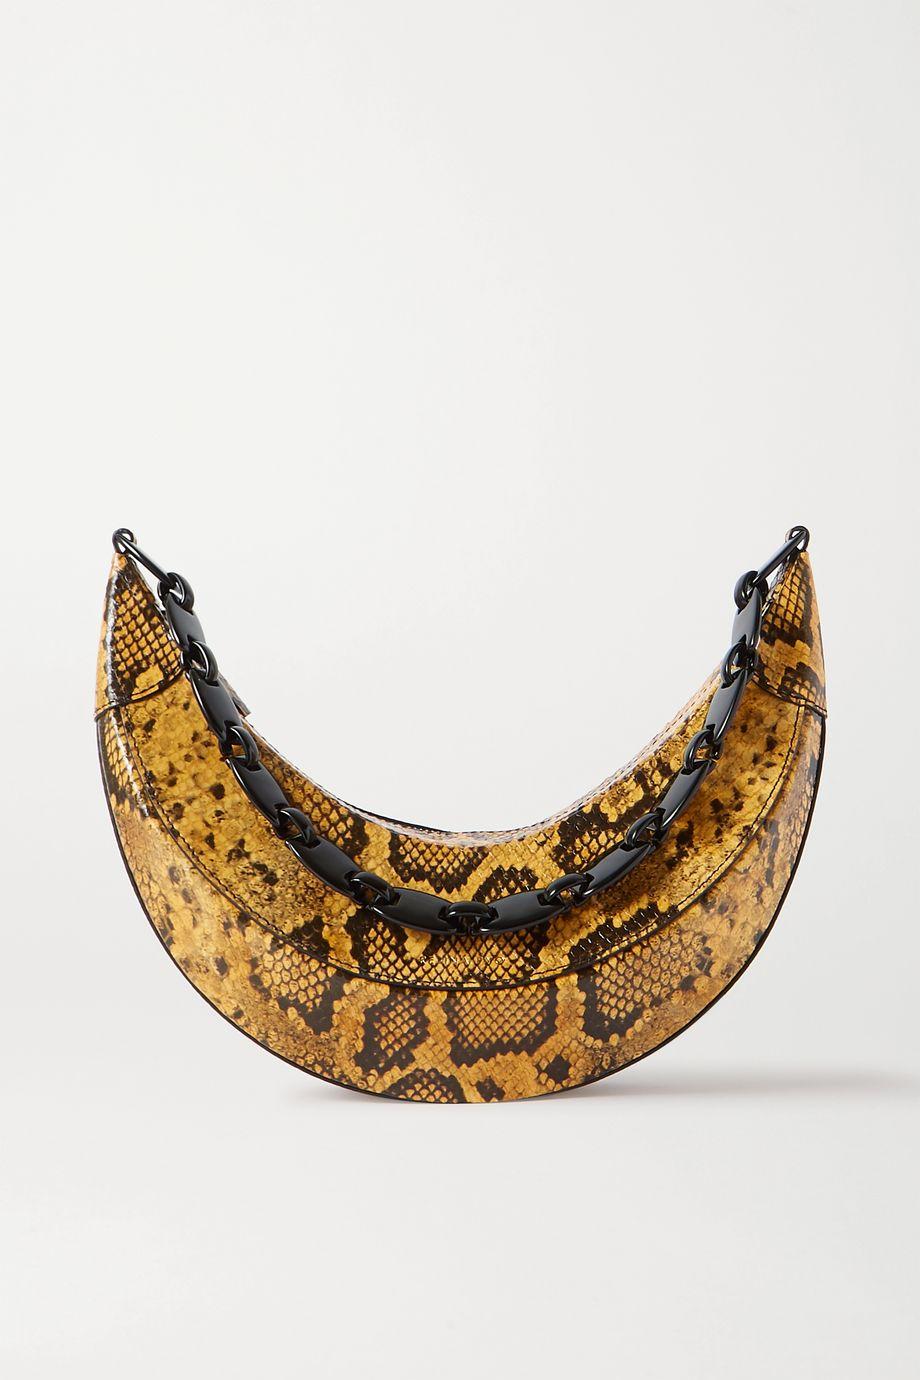 REJINA PYO Sac porté épaule en cuir glacé effet serpent Banana